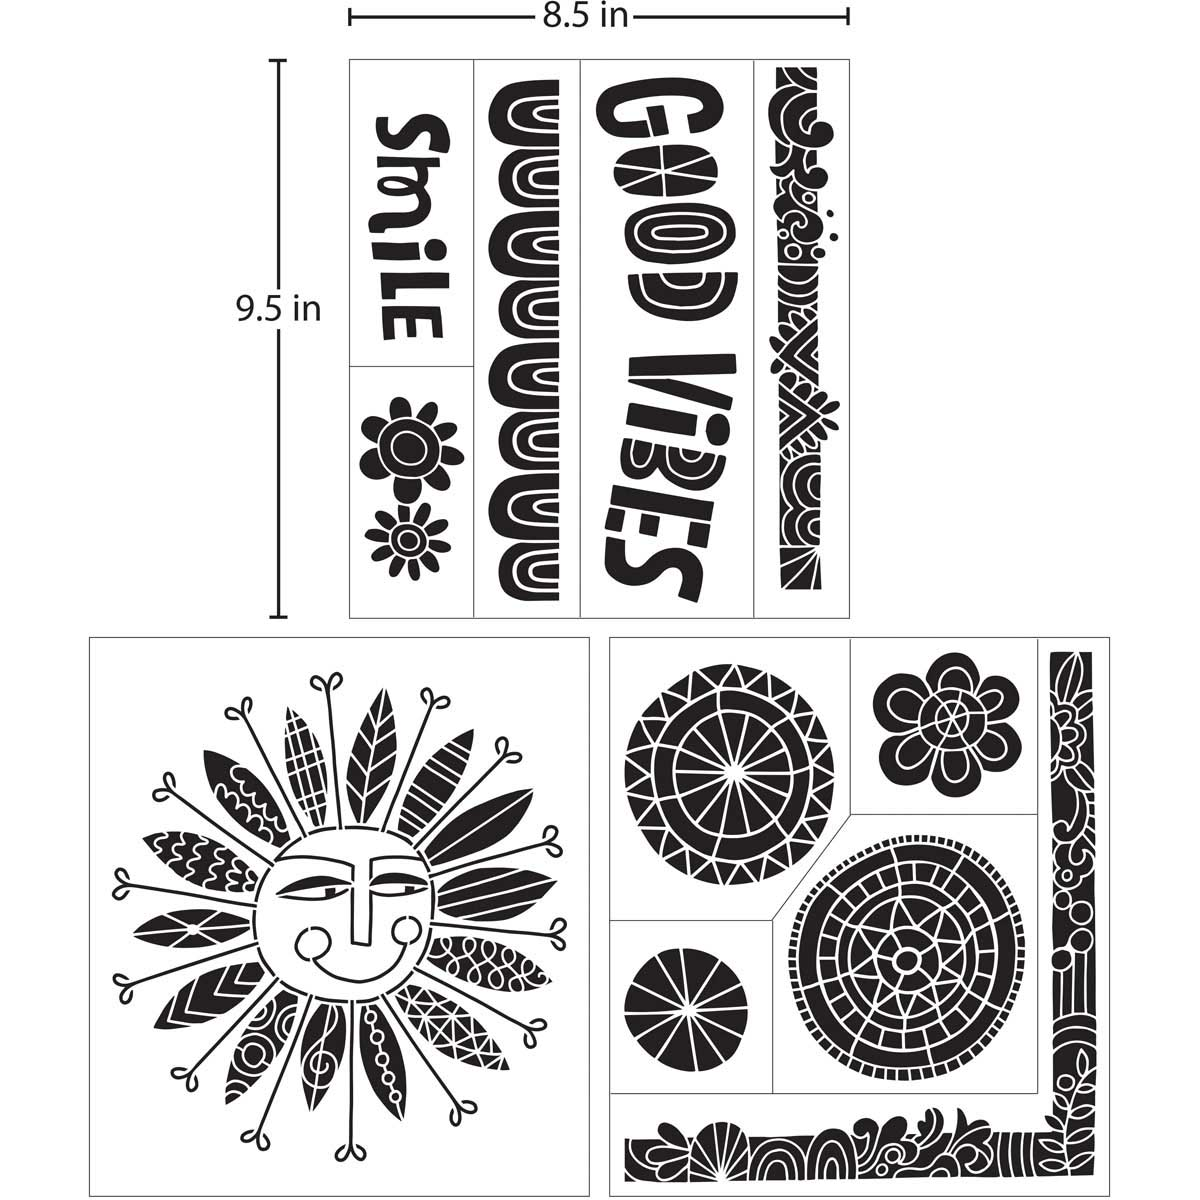 Hallmark Handcrafted Adhesive Stencils - Doodle Design Pack, 8-1/2